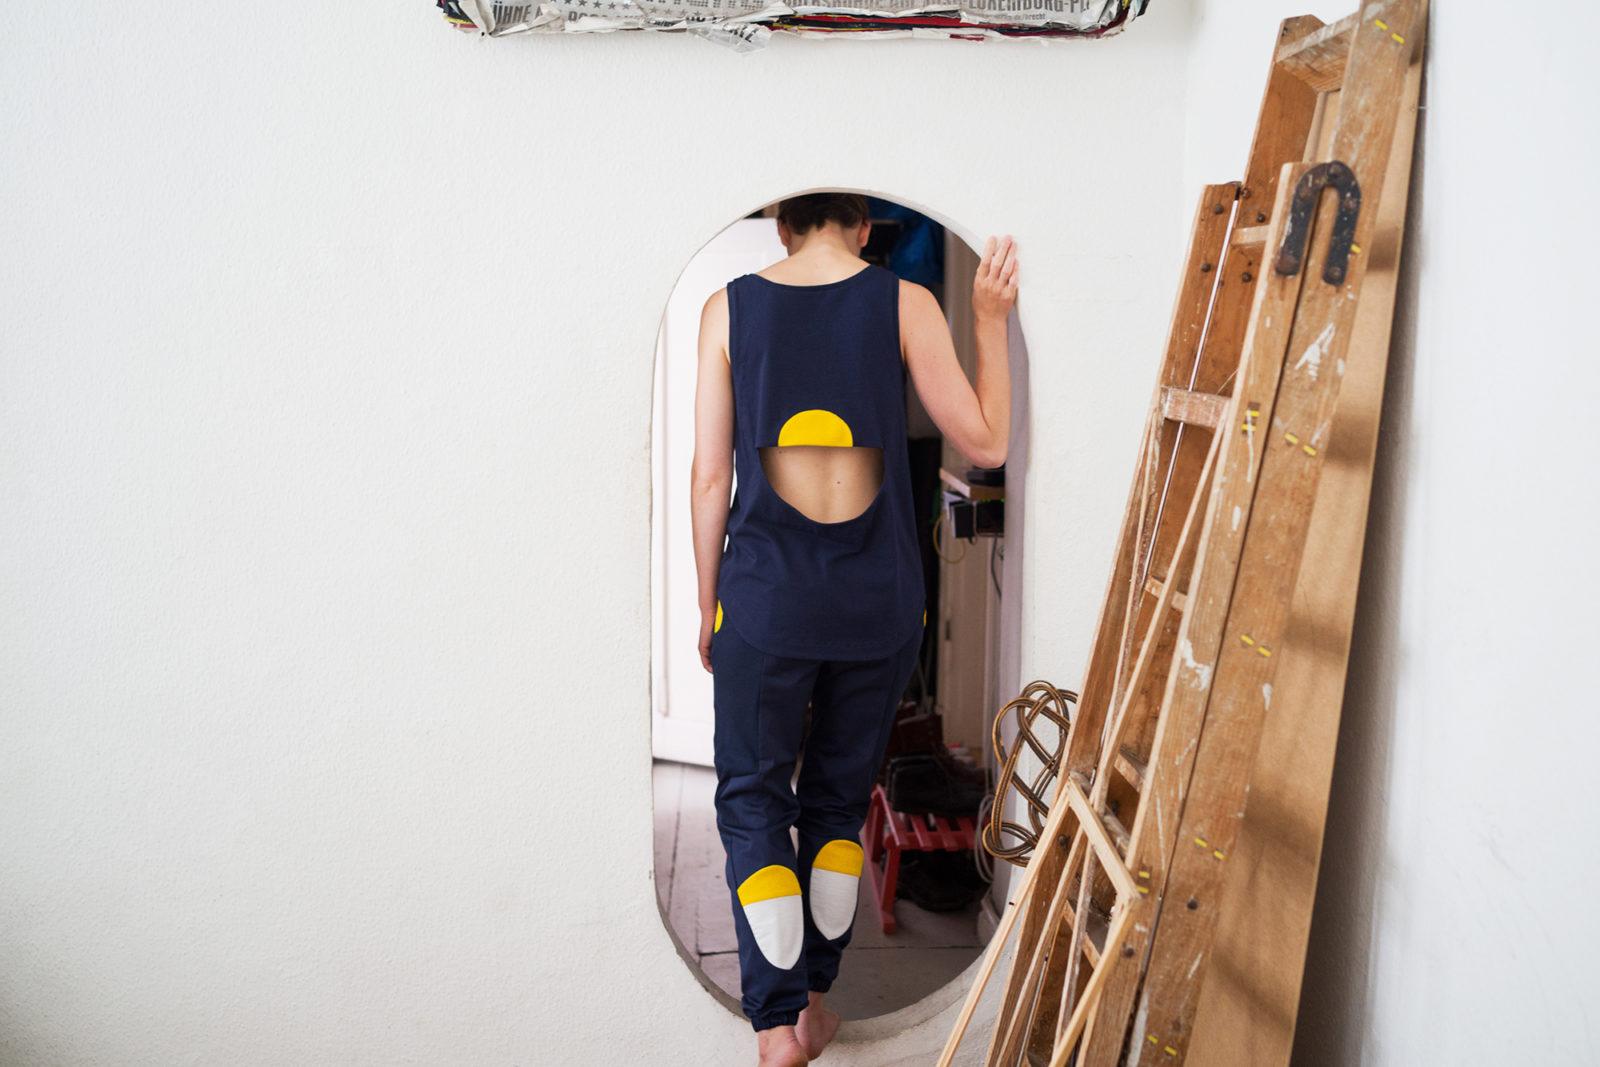 TRECHES | Jei Brunneau Russow | Handmade Fashion | Berlin Neukölln | SHIO | Fotos: Jei Bruneau Rossow | GROSS∆RTIG